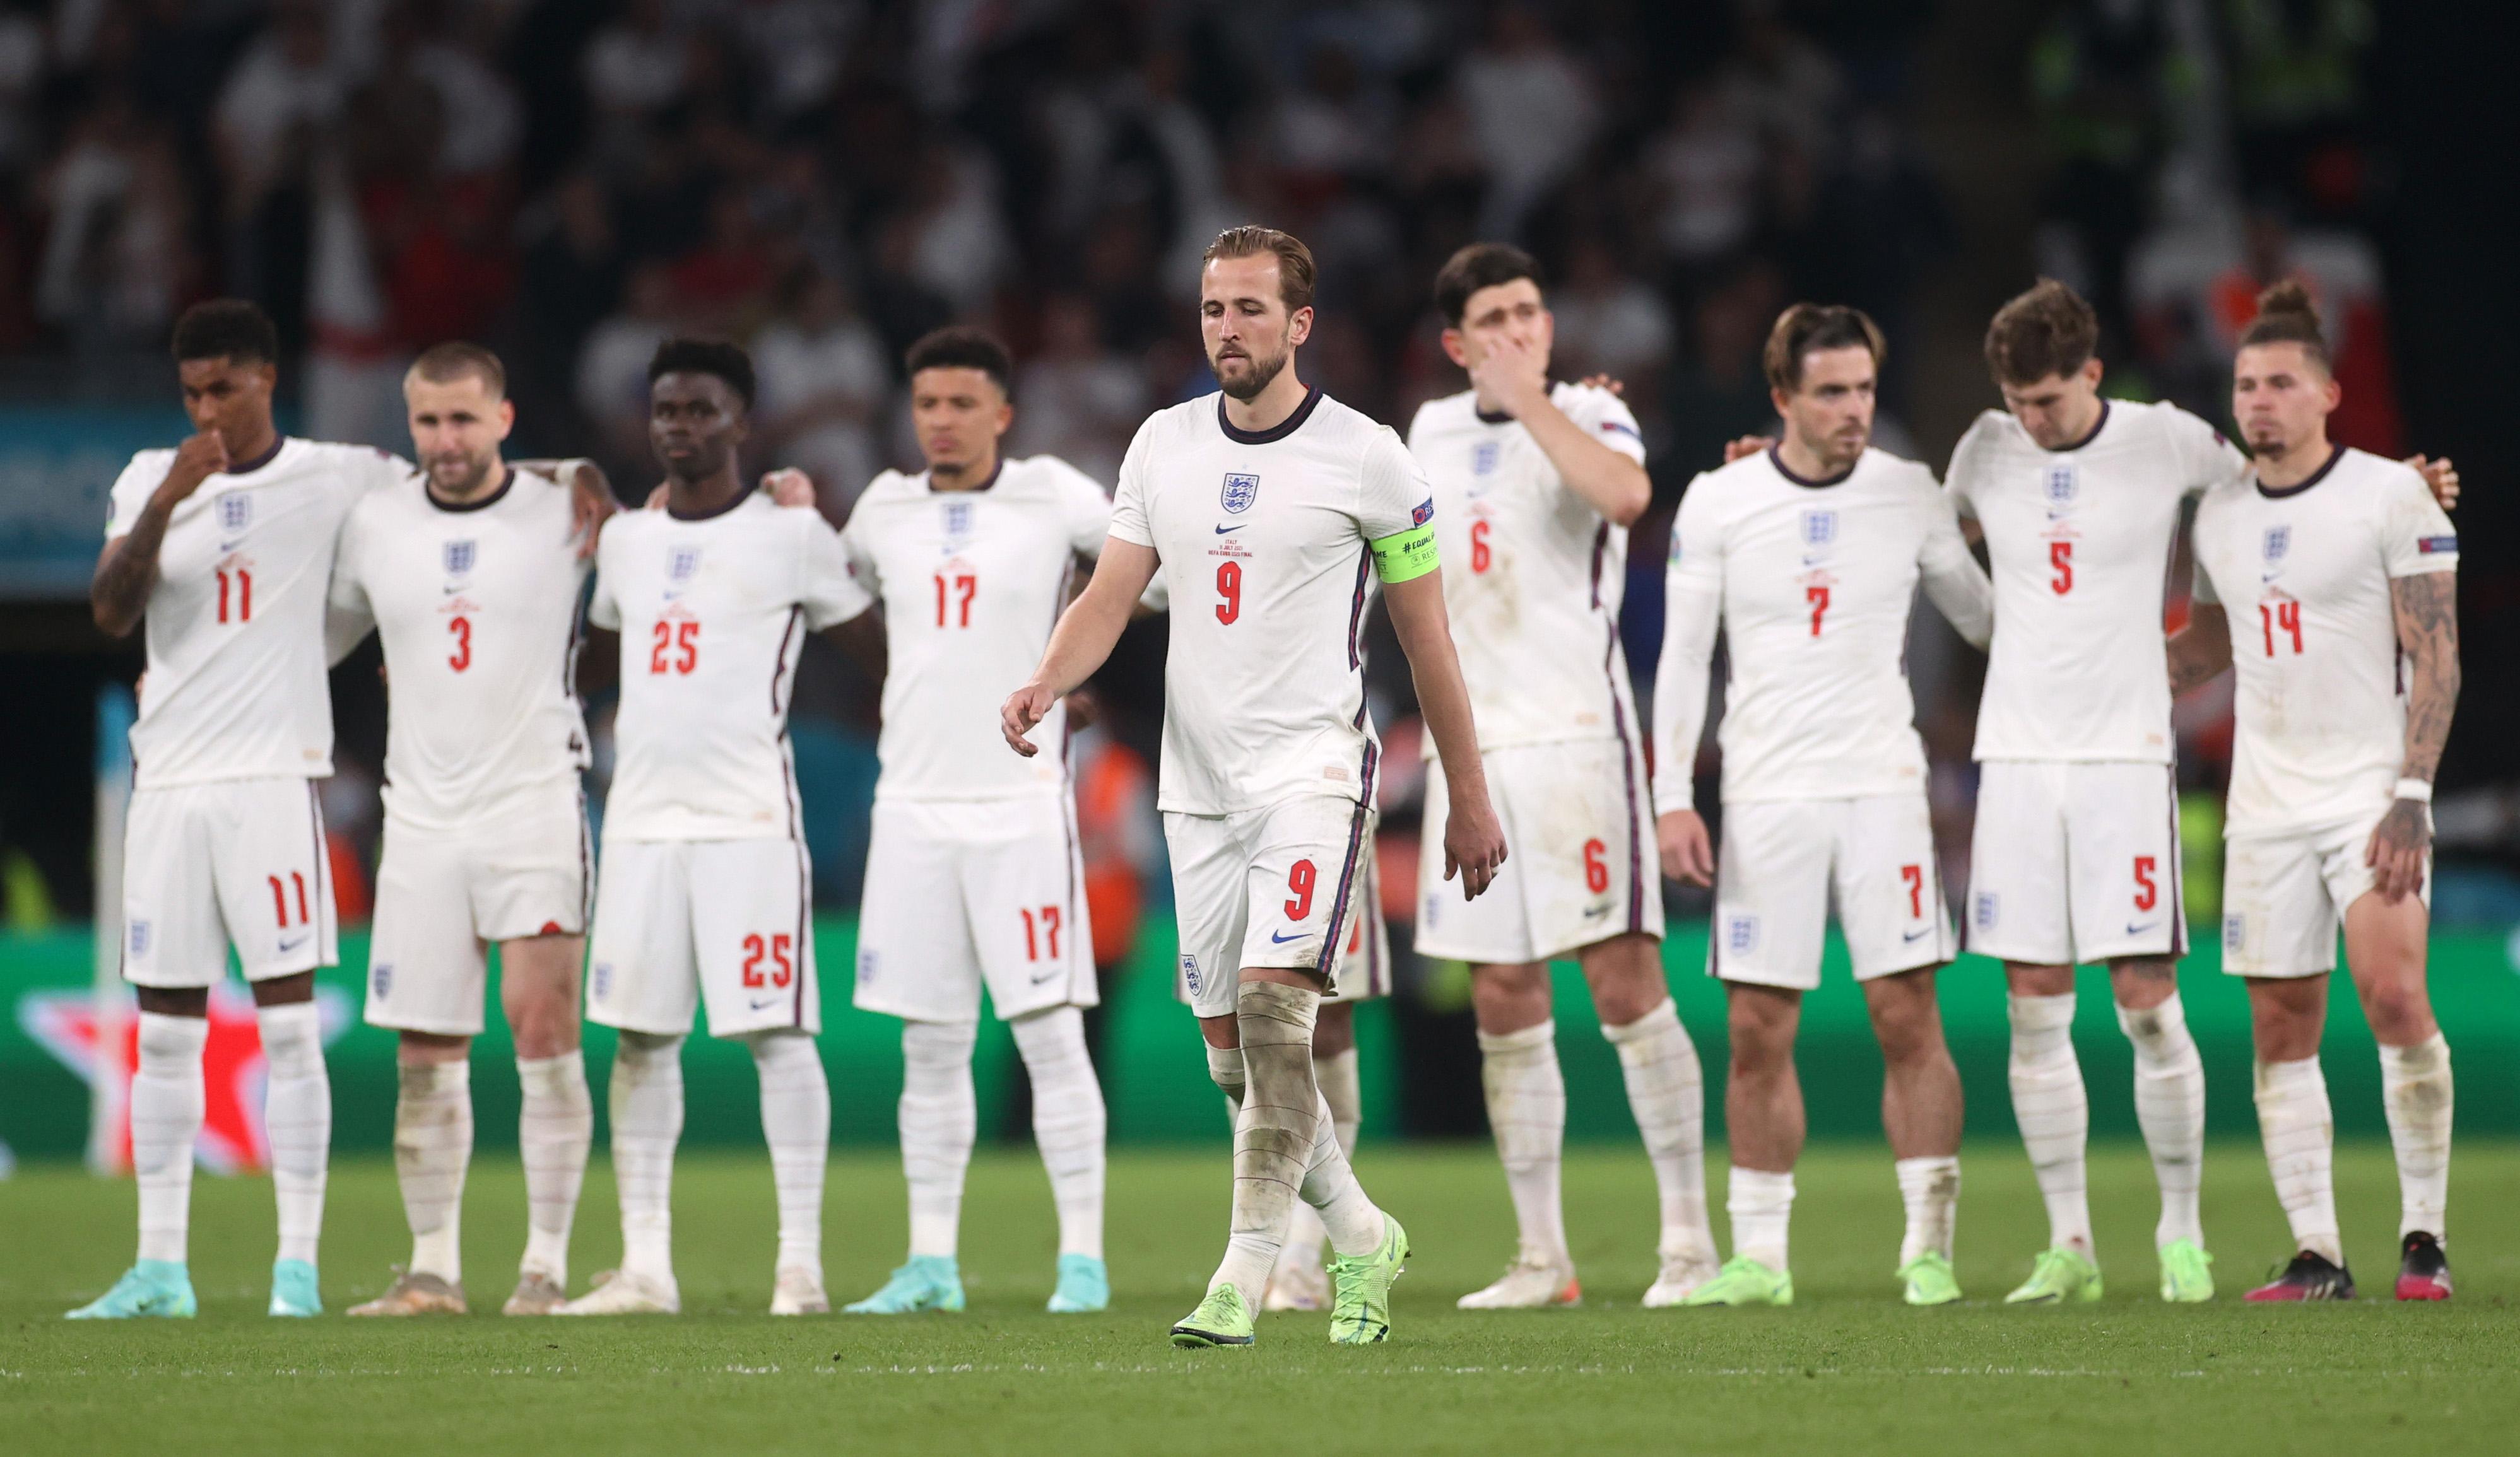 Soccer Football - Euro 2020 - Final - Italy v England - Wembley Stadium, London, Britain - July 11, 2021 England's Harry Kane walks up during a penalty shootout Pool via REUTERS/Carl Recine